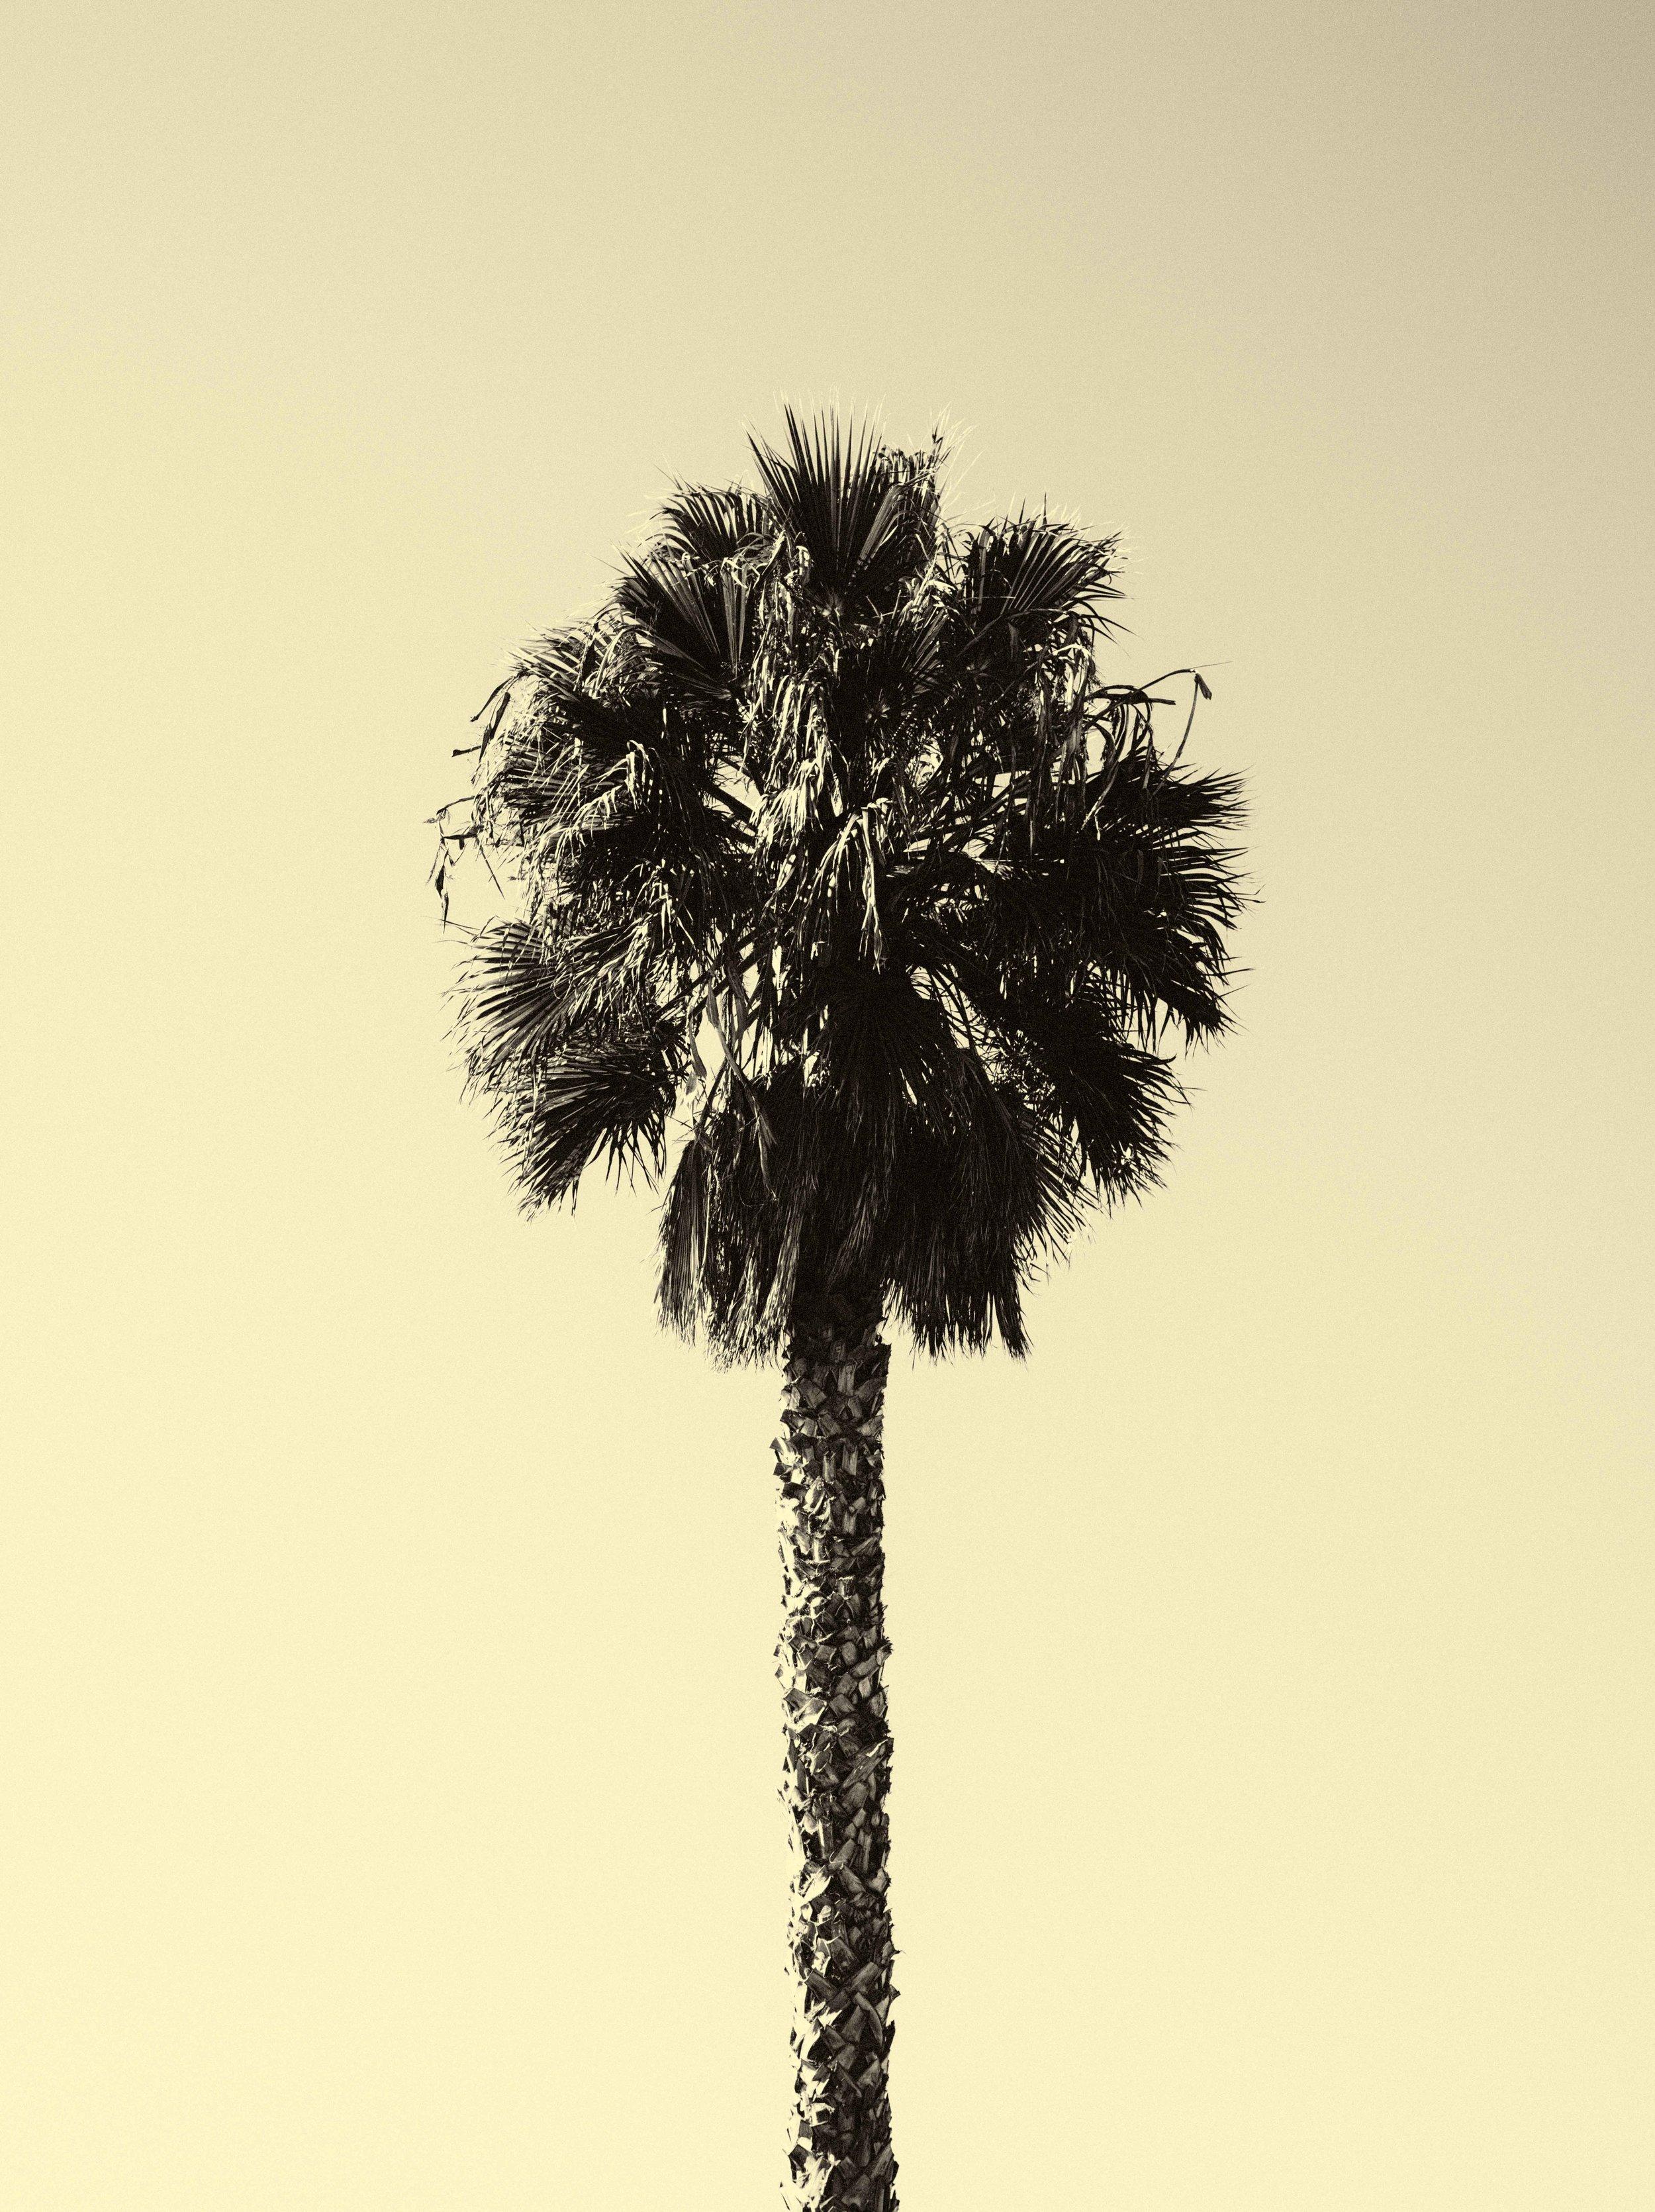 PALM_TREES-5852_V2.jpg